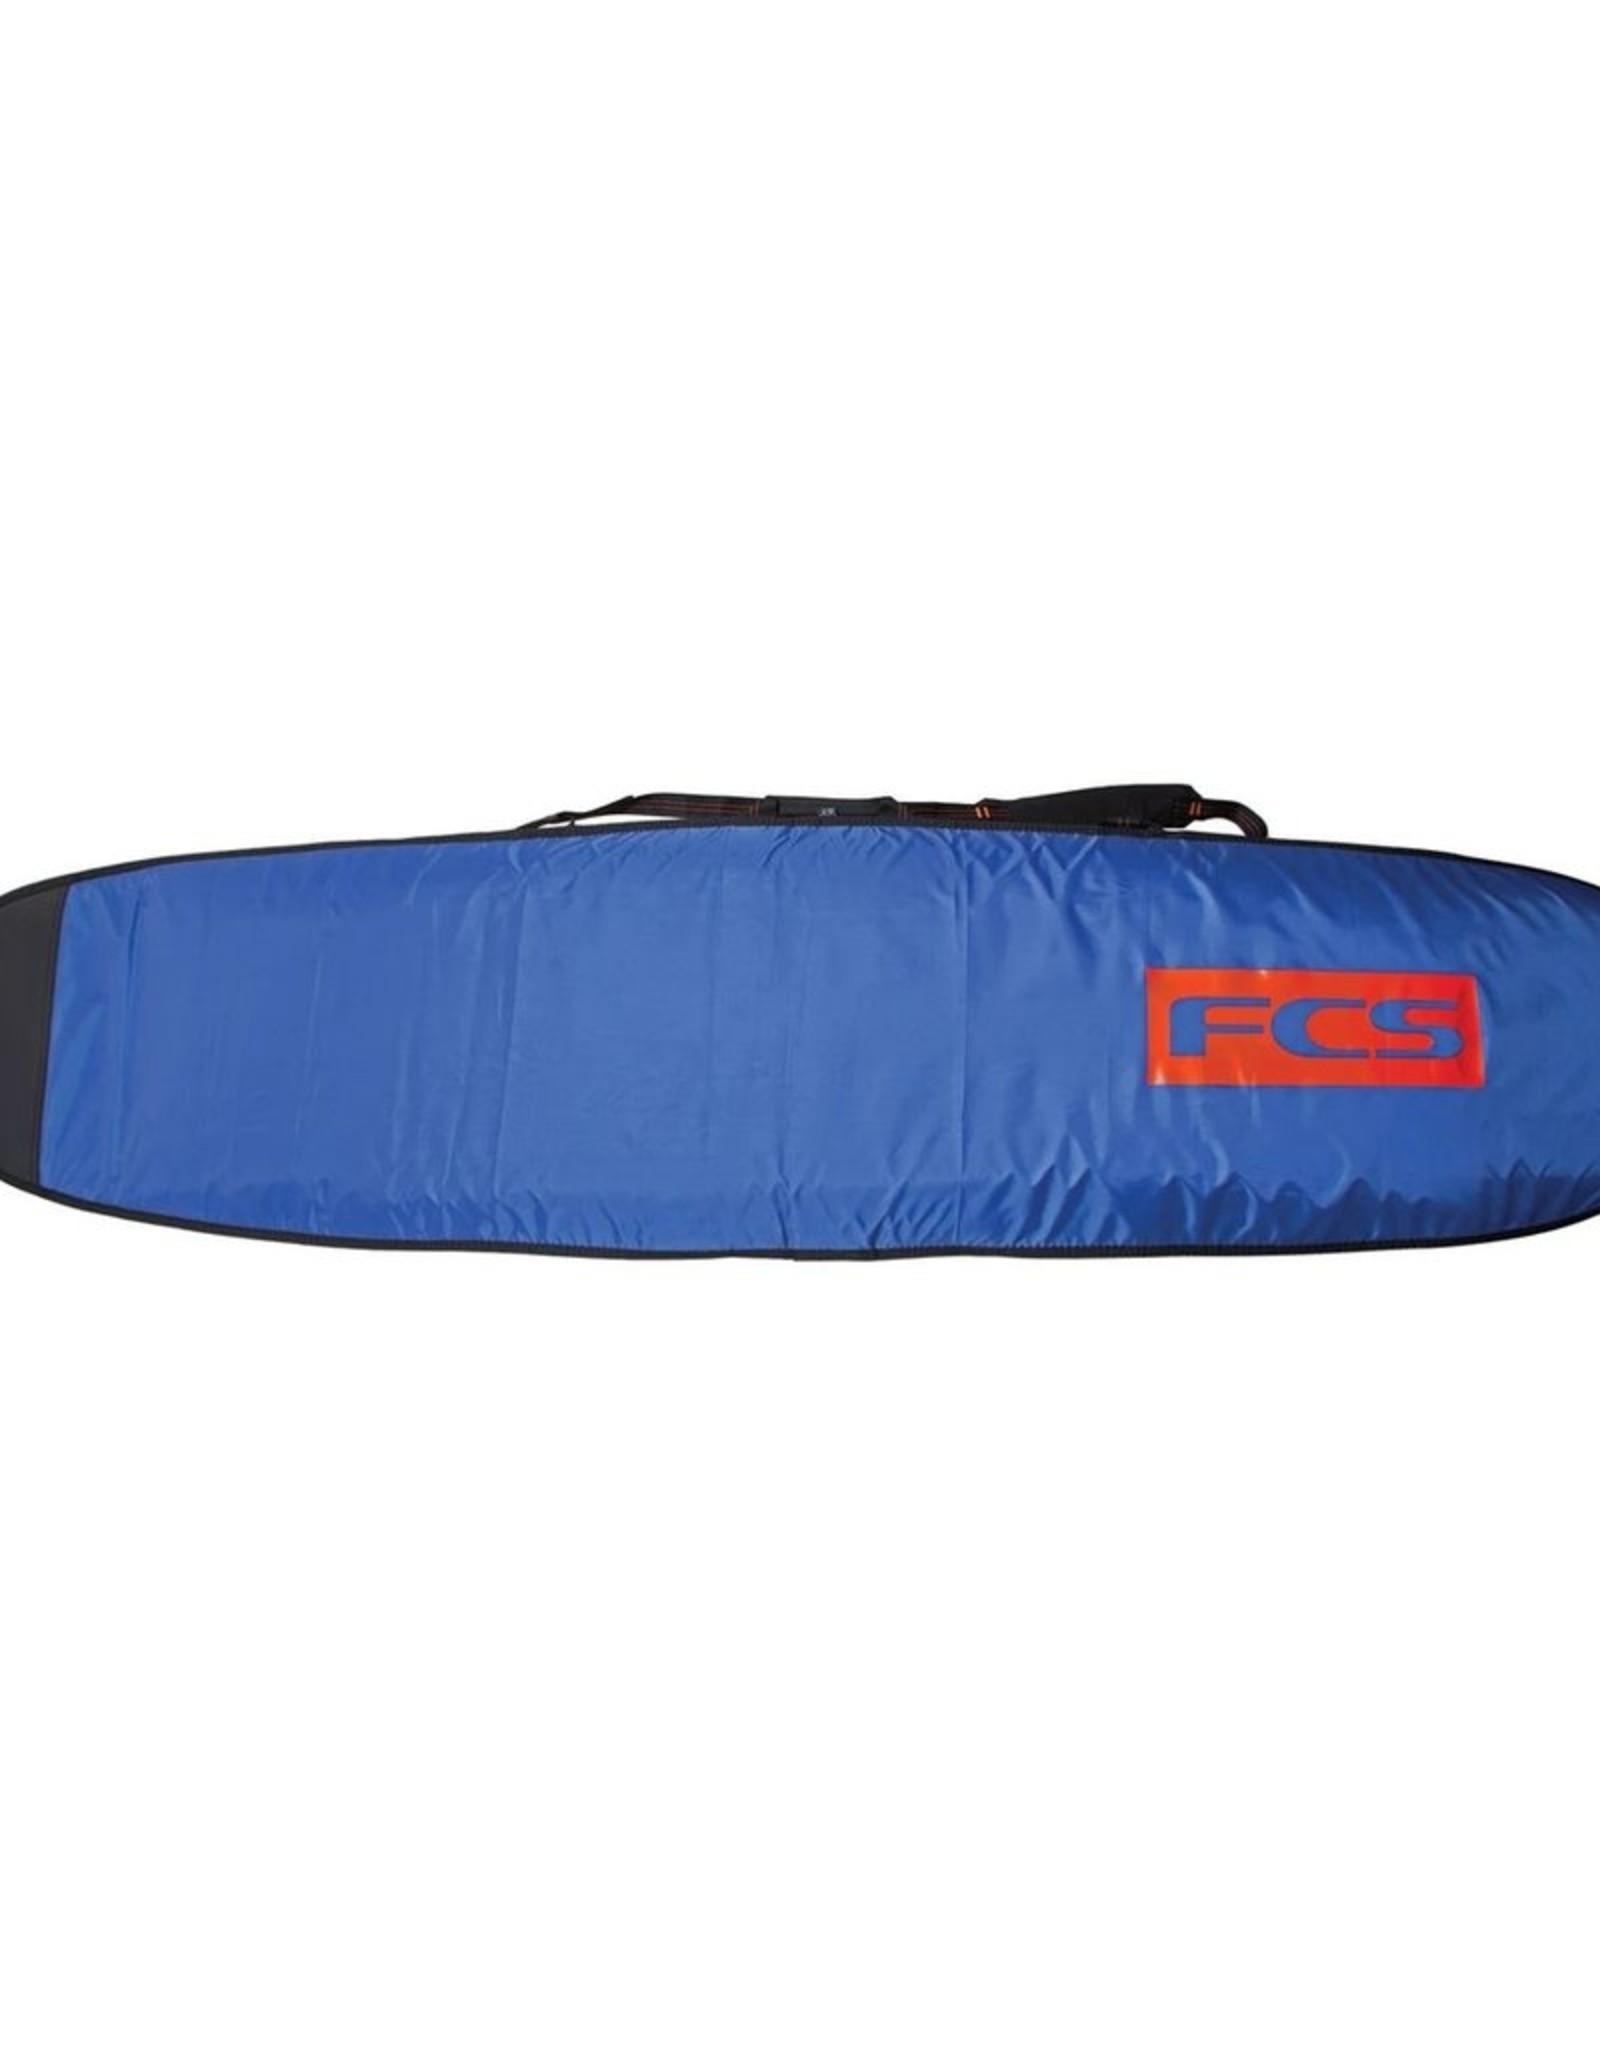 FCS FCS Classic Longboard Bags 9 ft 6 in Steel Blue- White